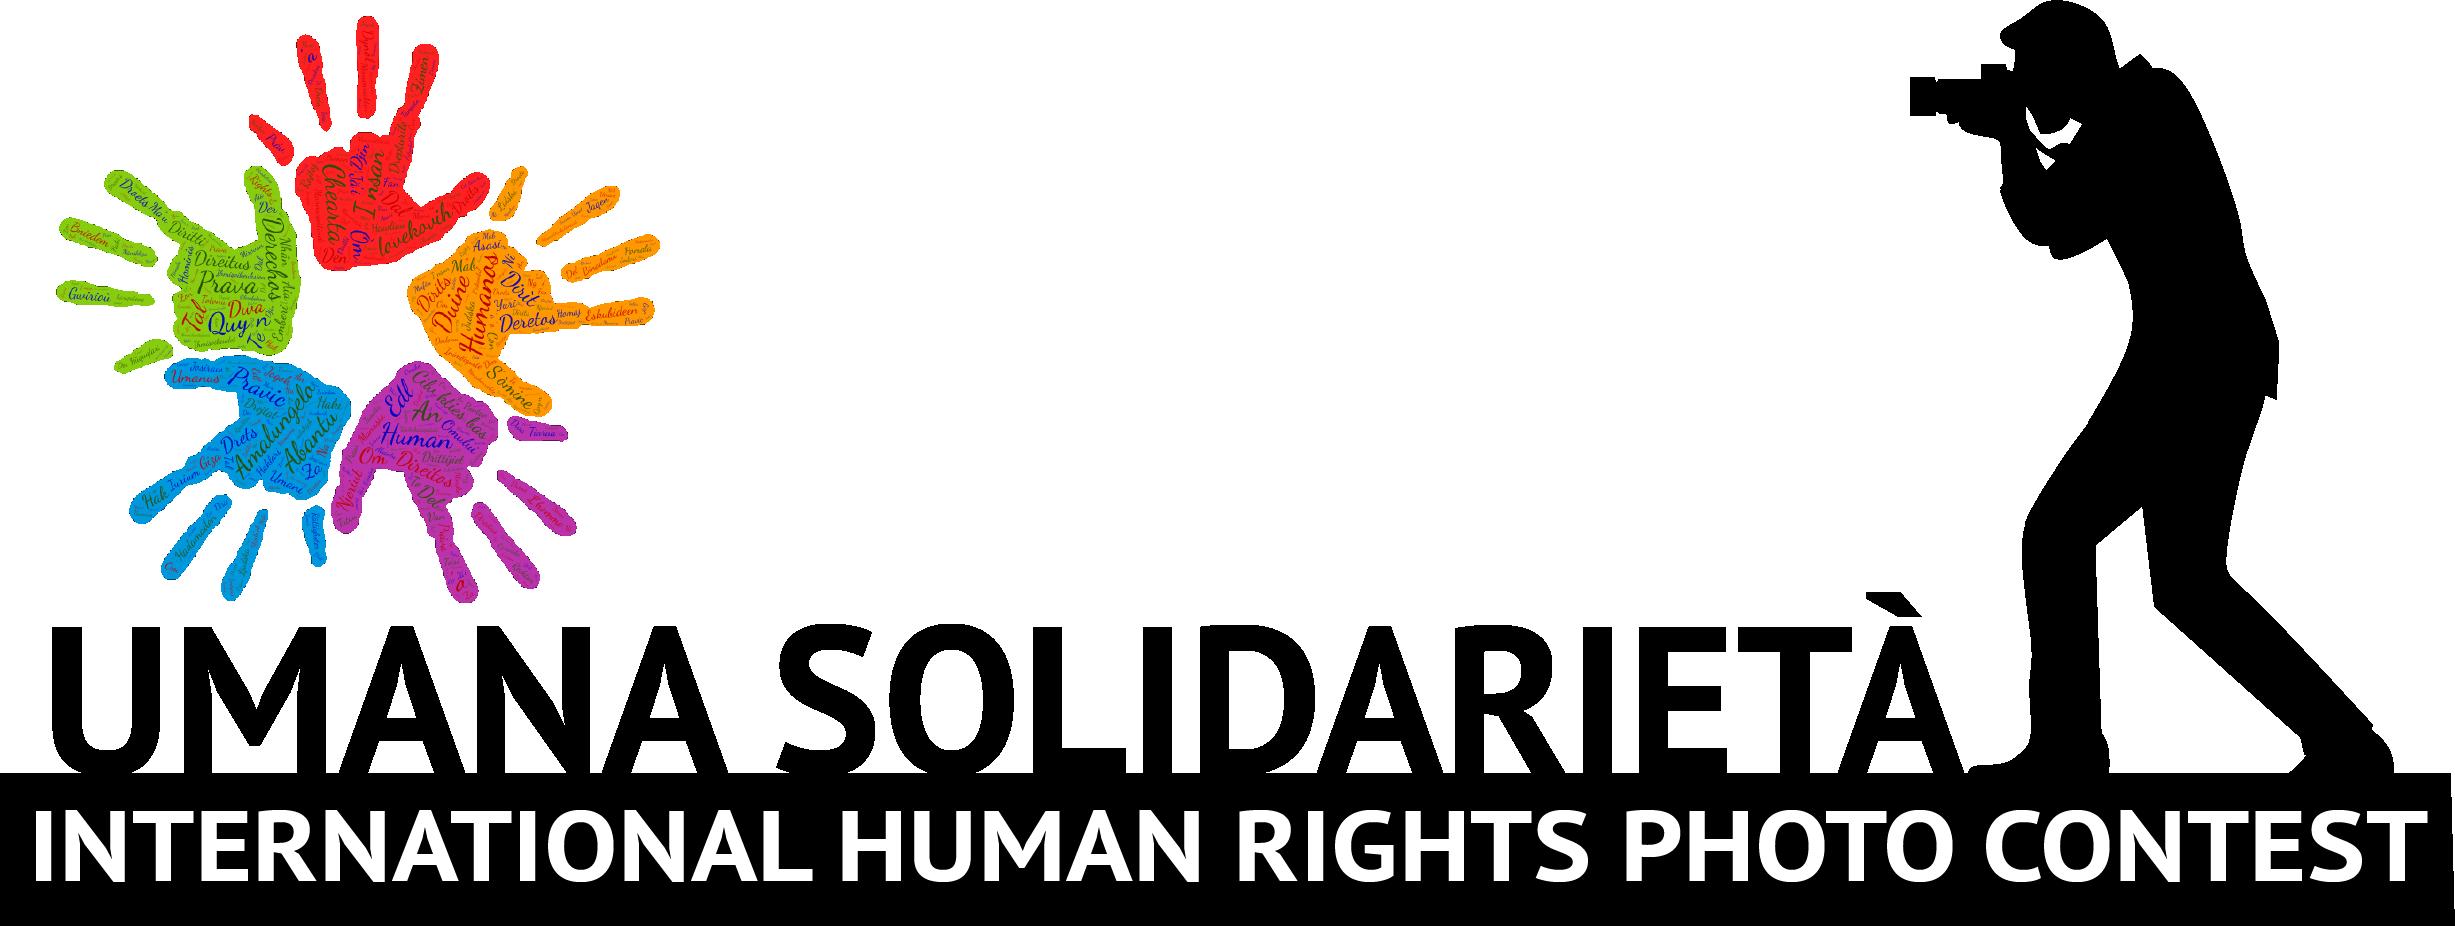 Umana Solidarietà International Human Rights Photo Contest - logo